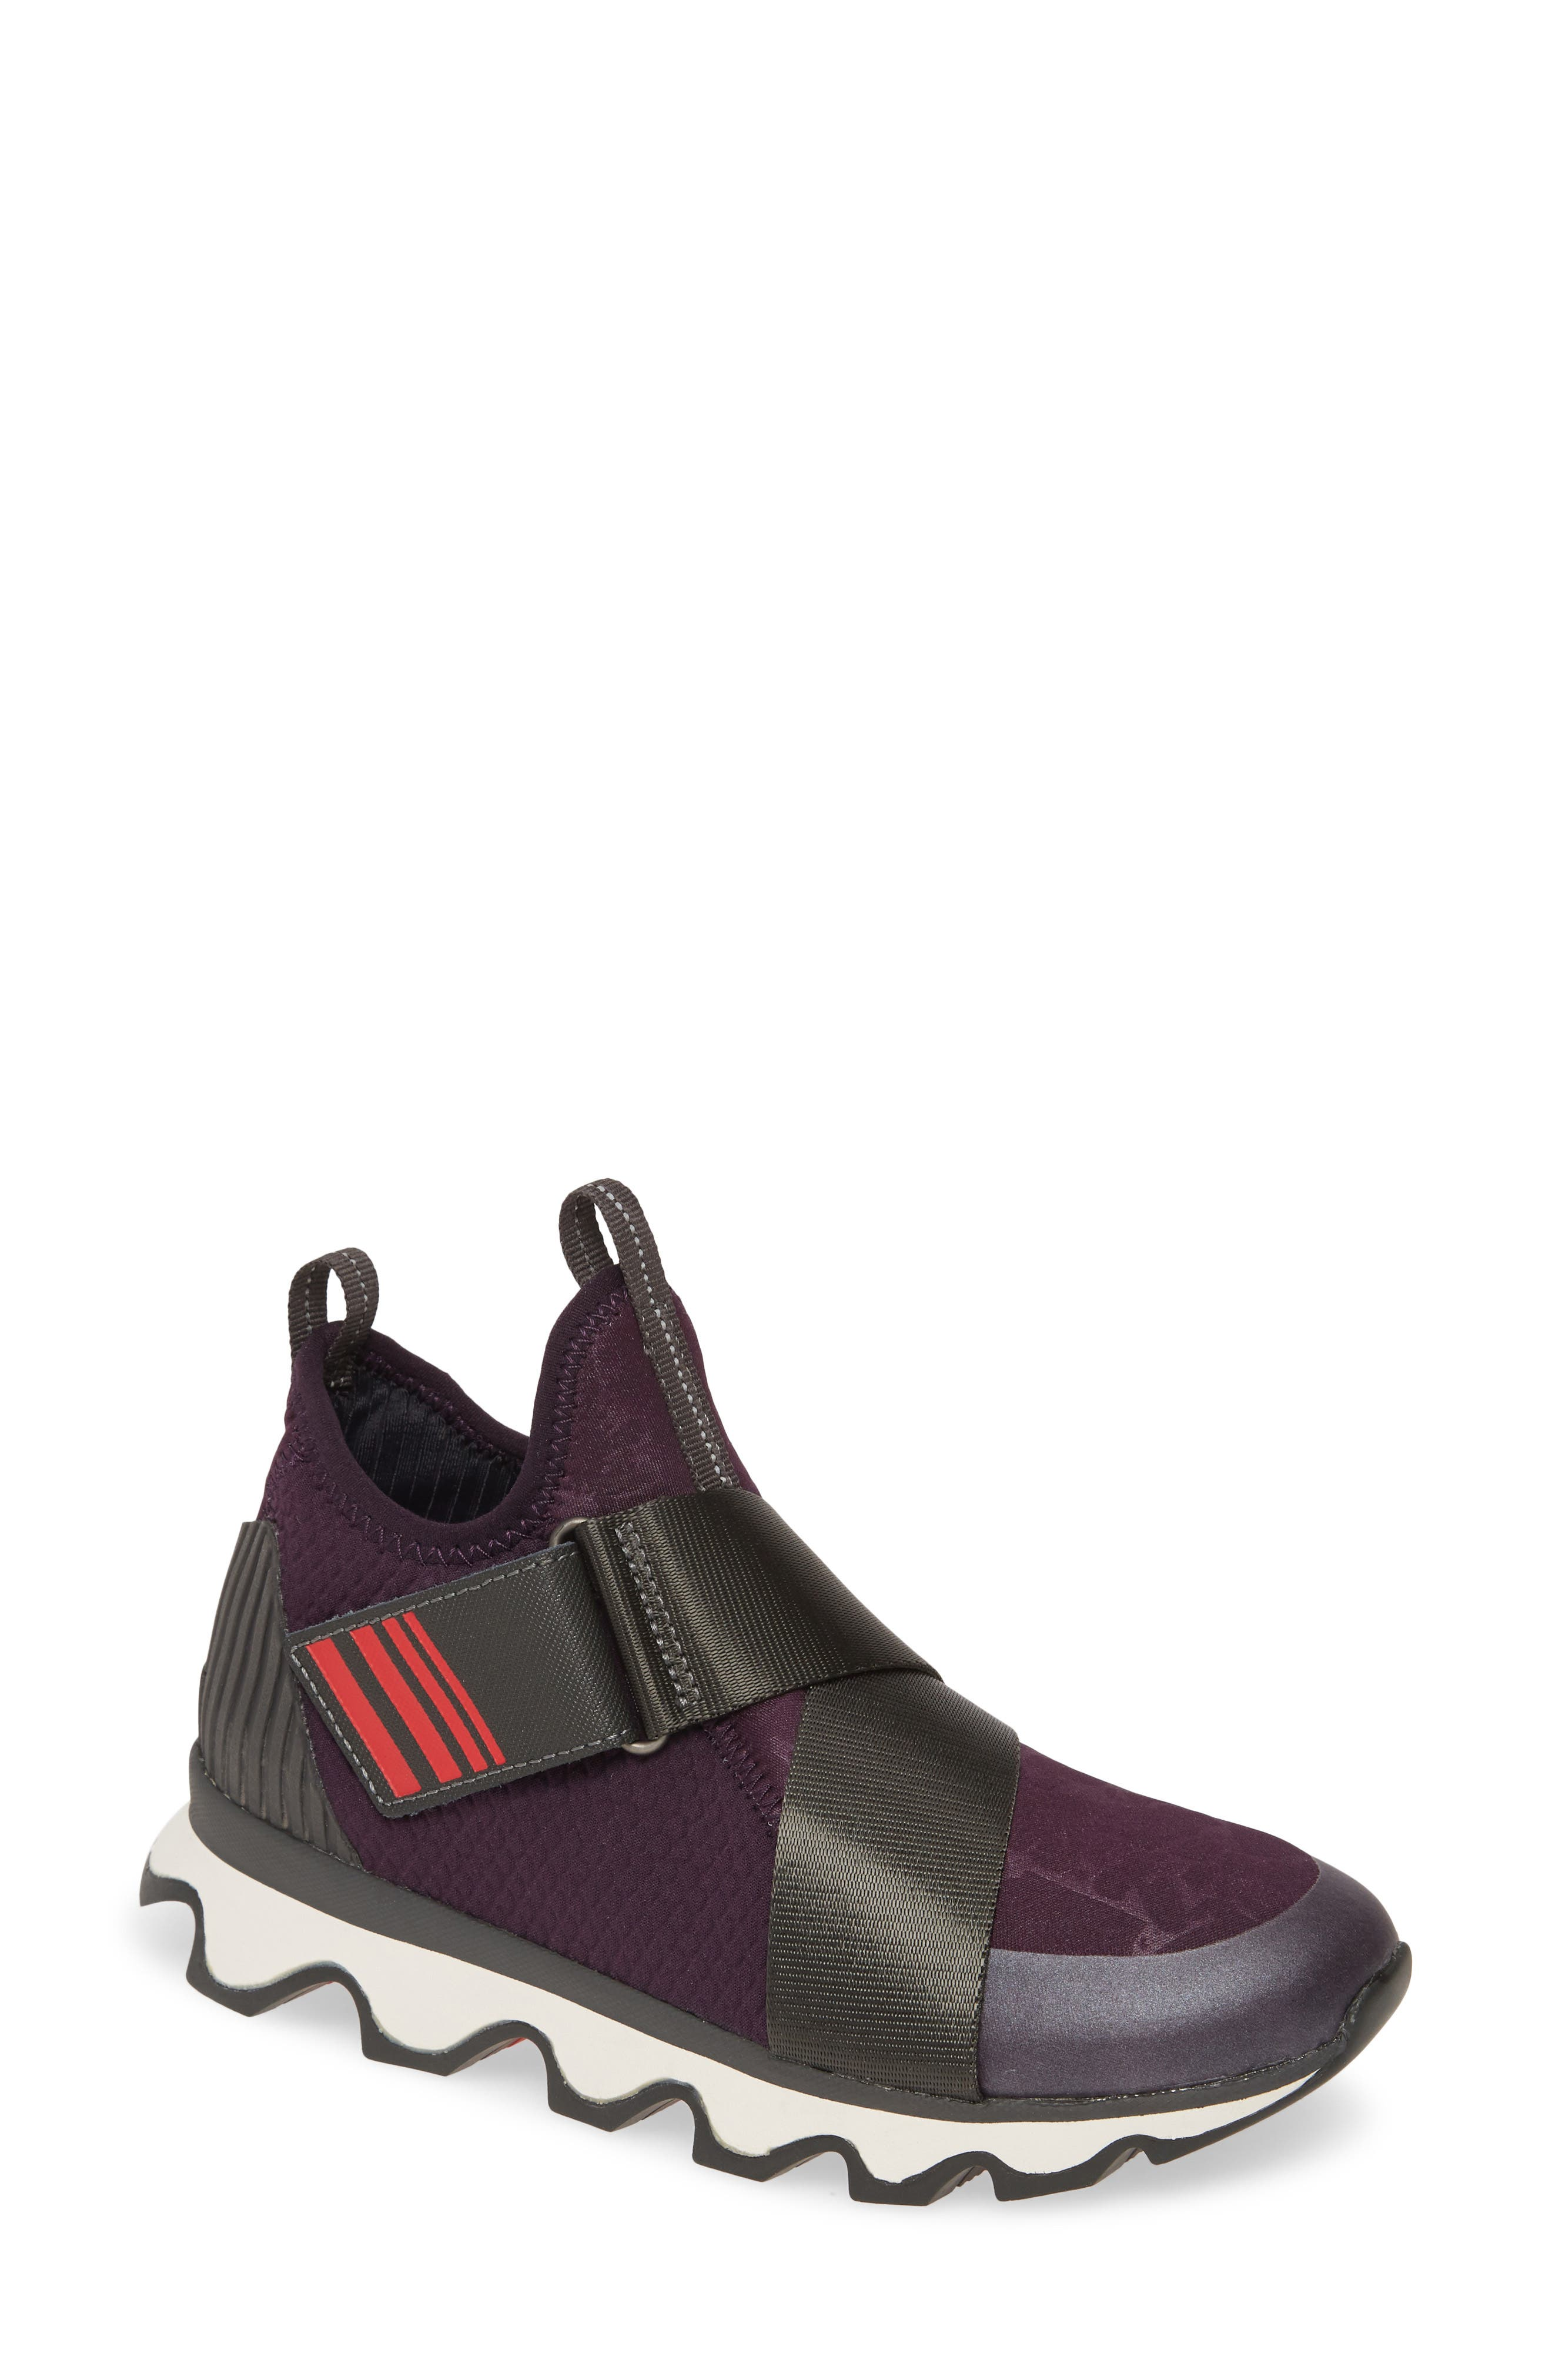 Sorel | Kinetic High Top Sneaker